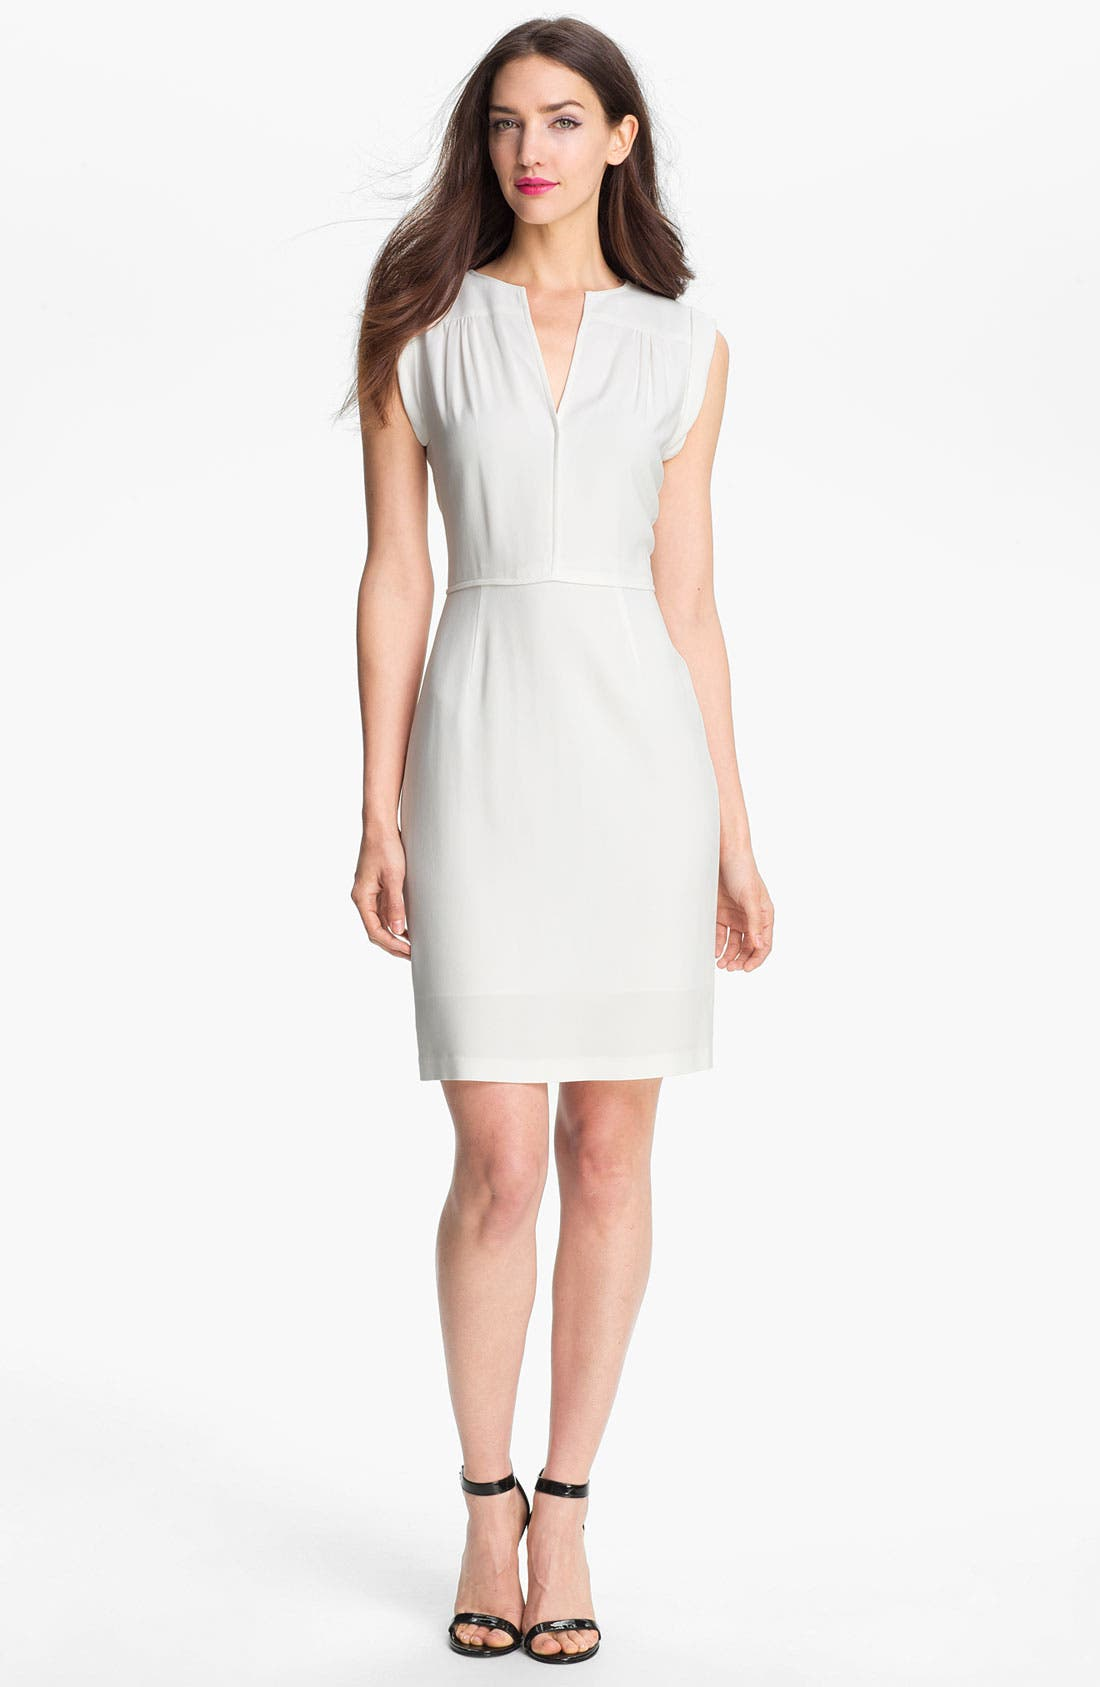 Alternate Image 1 Selected - Theory 'Nev' Stretch Knit Sheath Dress